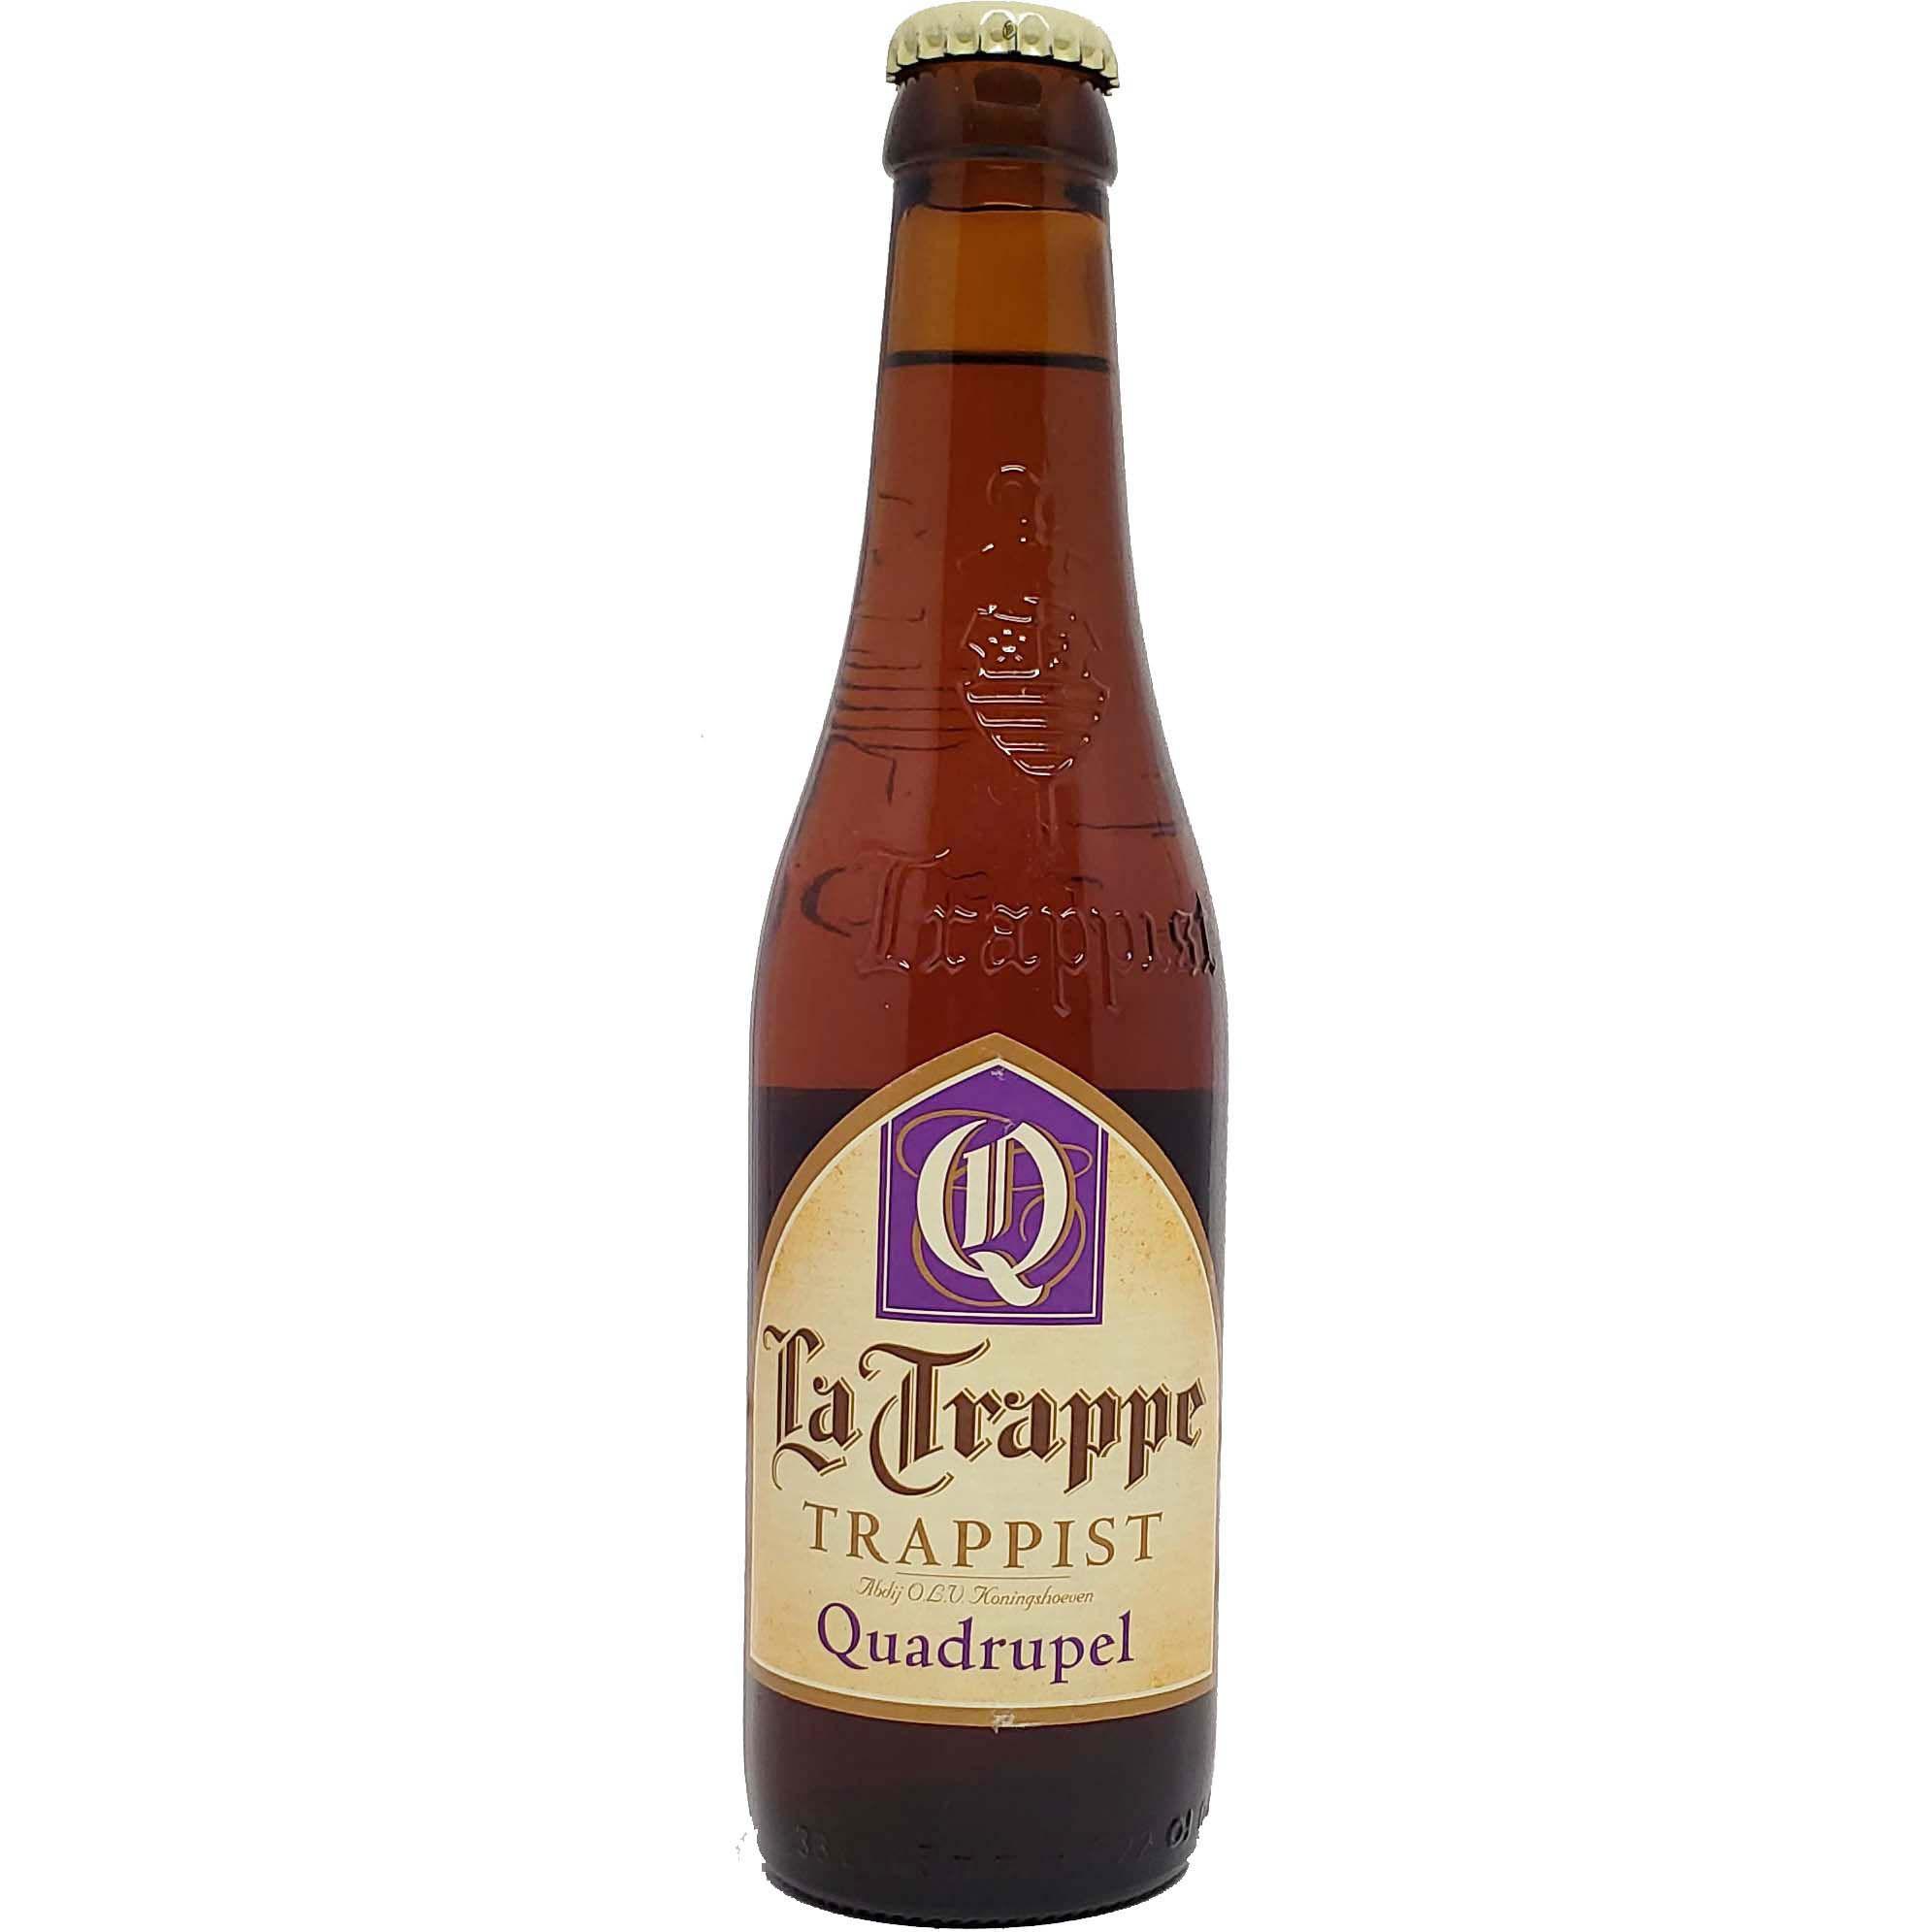 Cerveja  La Trappe  Quadrupel - 330ml -